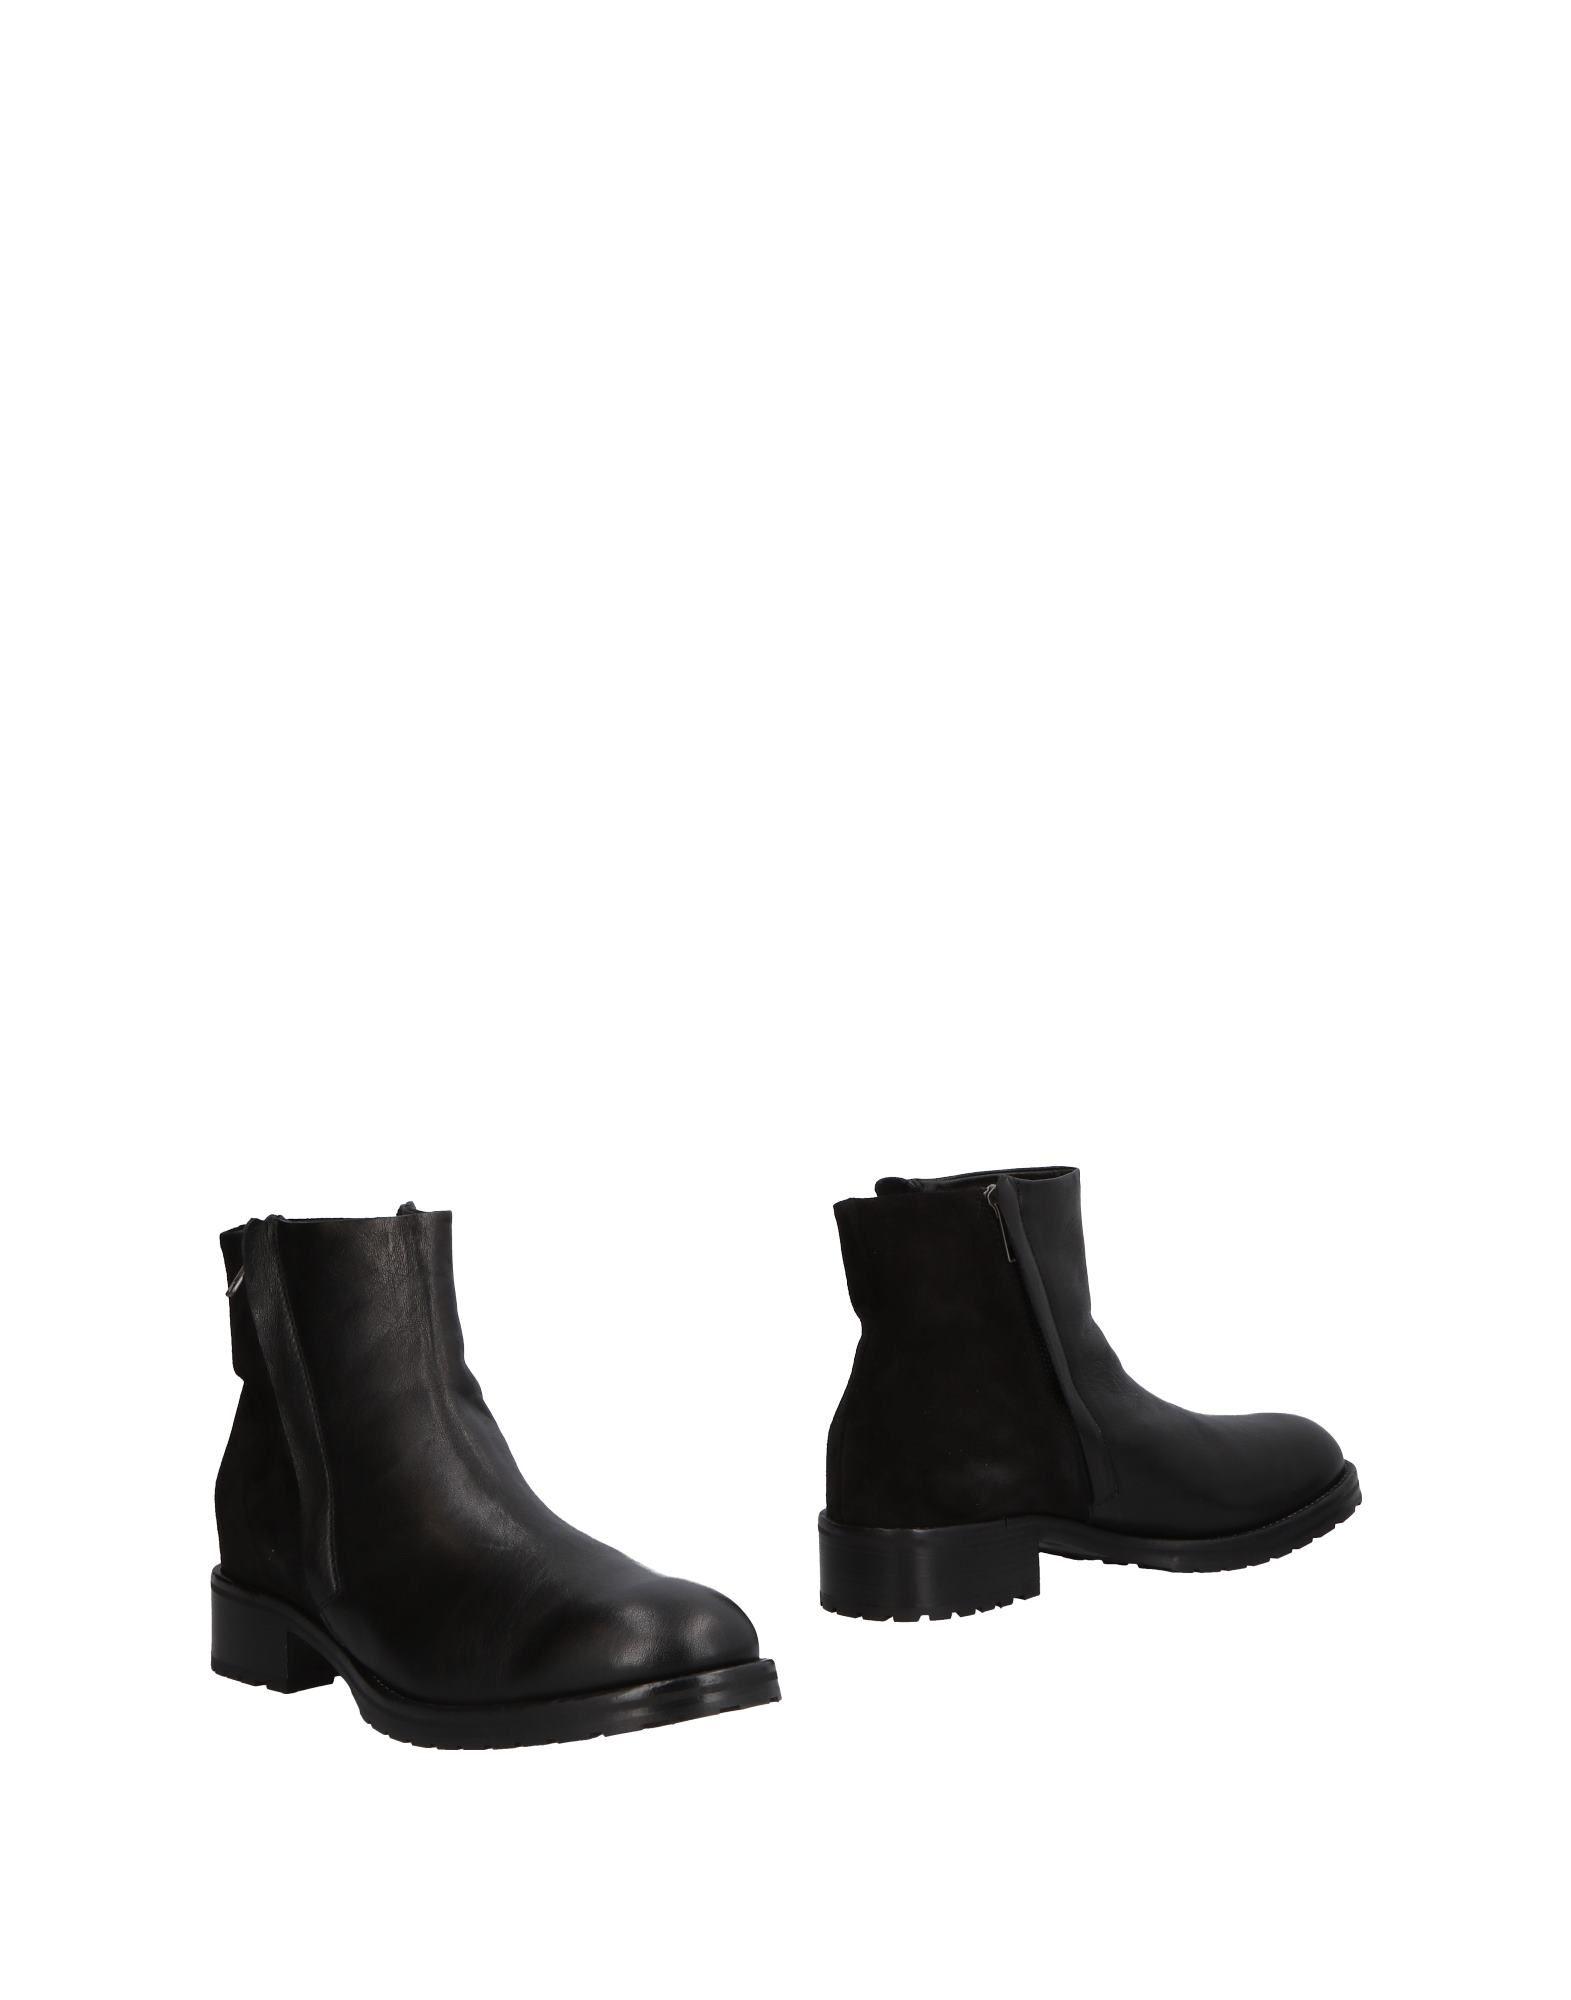 Stilvolle billige Schuhe Lemaré Stiefelette Damen  11485967TJ 11485967TJ 11485967TJ fd26f0